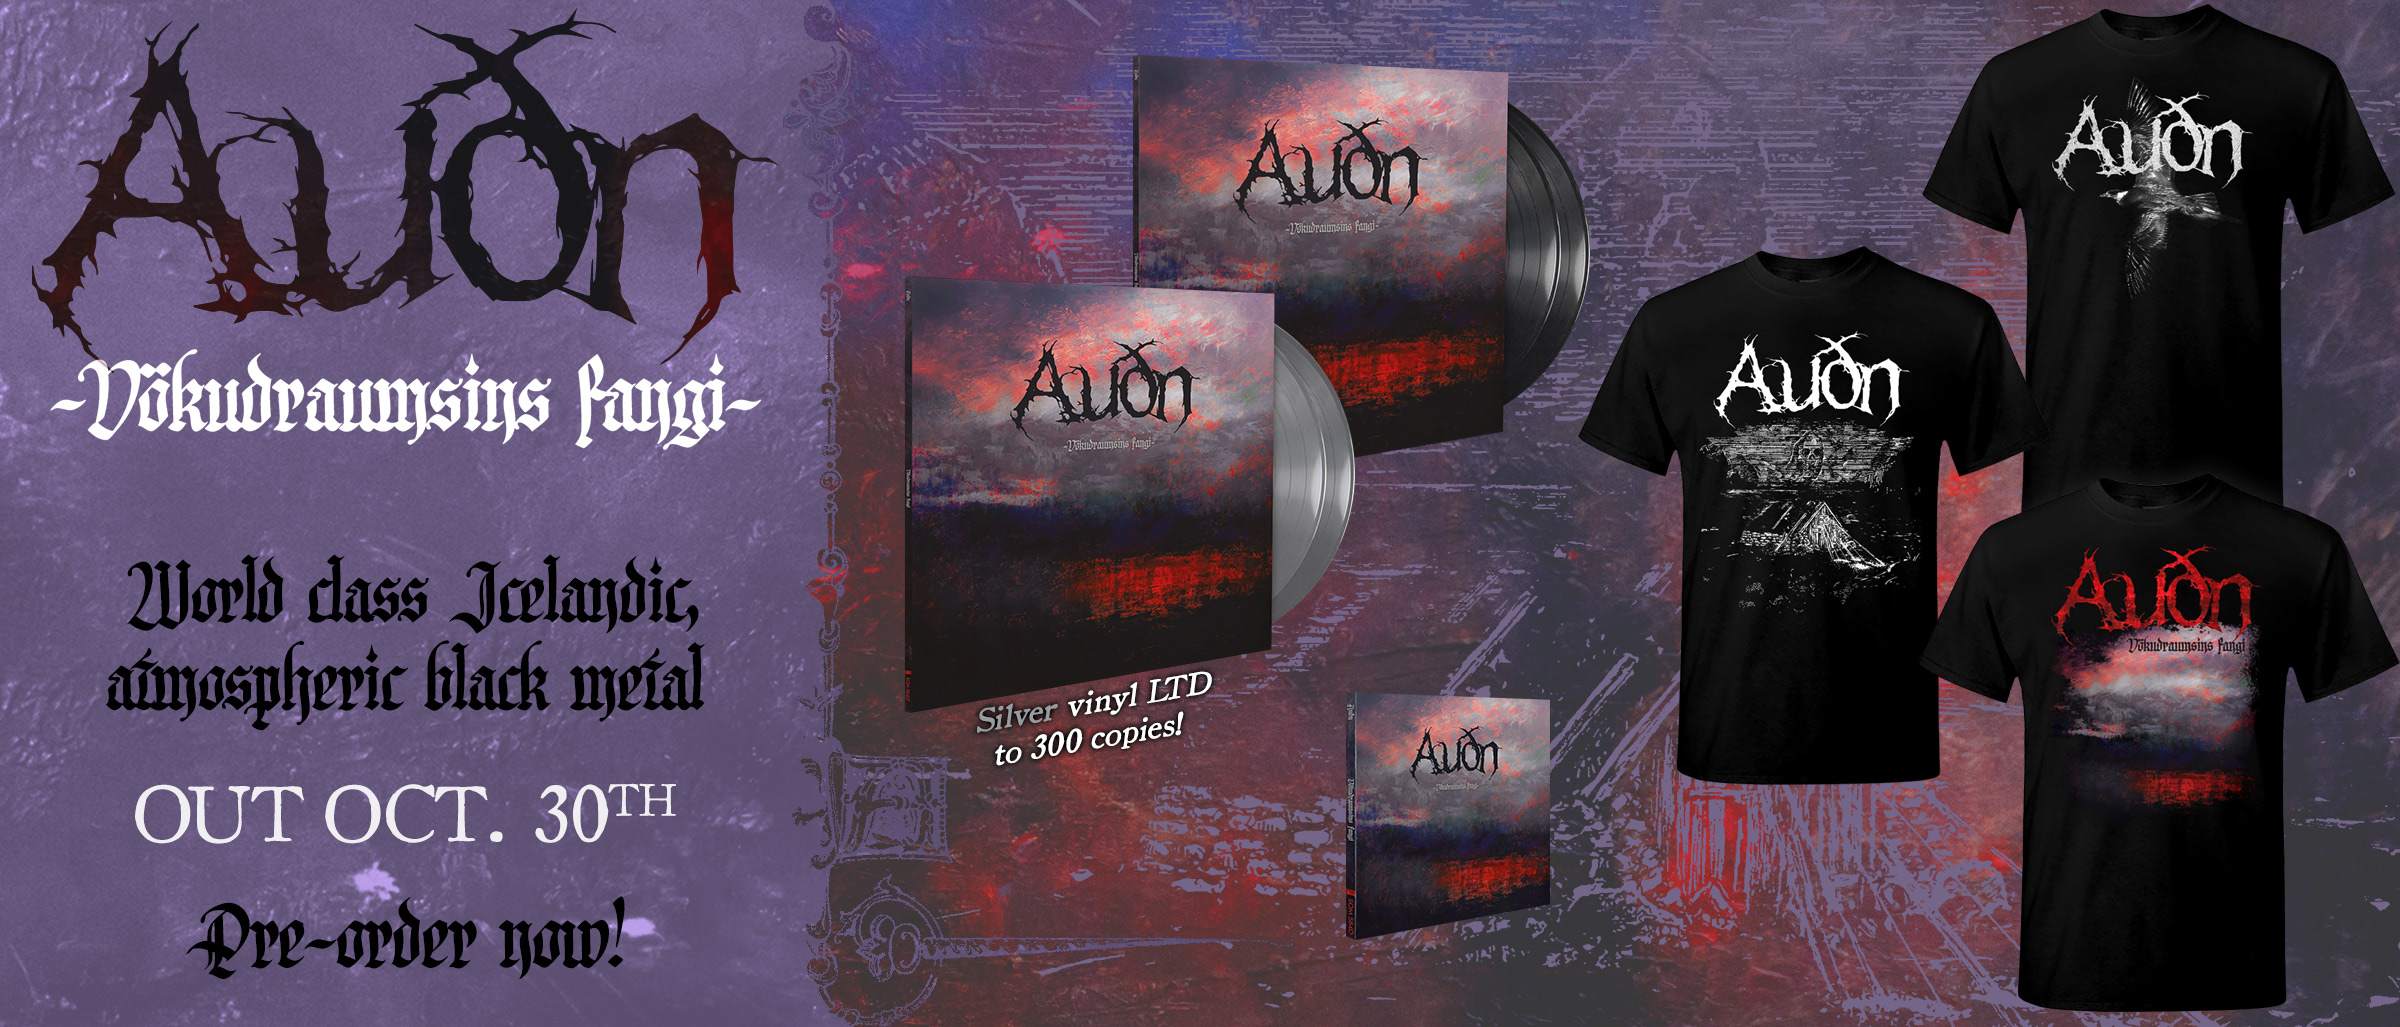 Audn - Vökudraumsins Fangi new album pre-order